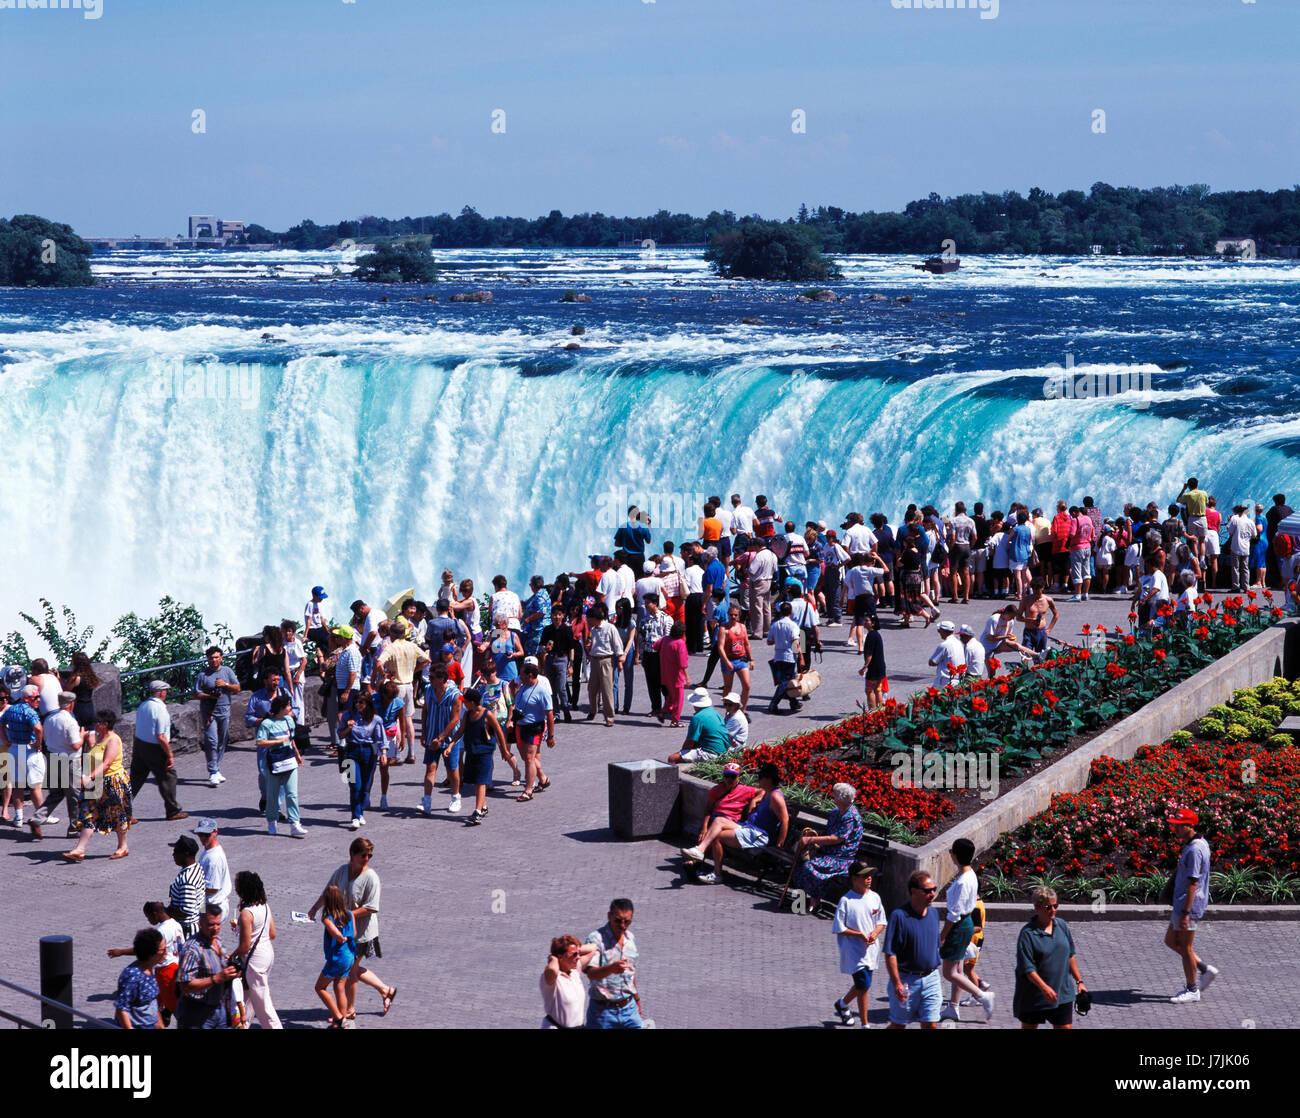 Les touristes l'affichage de la Niagara Falls, Ontario, Canada Photo Stock